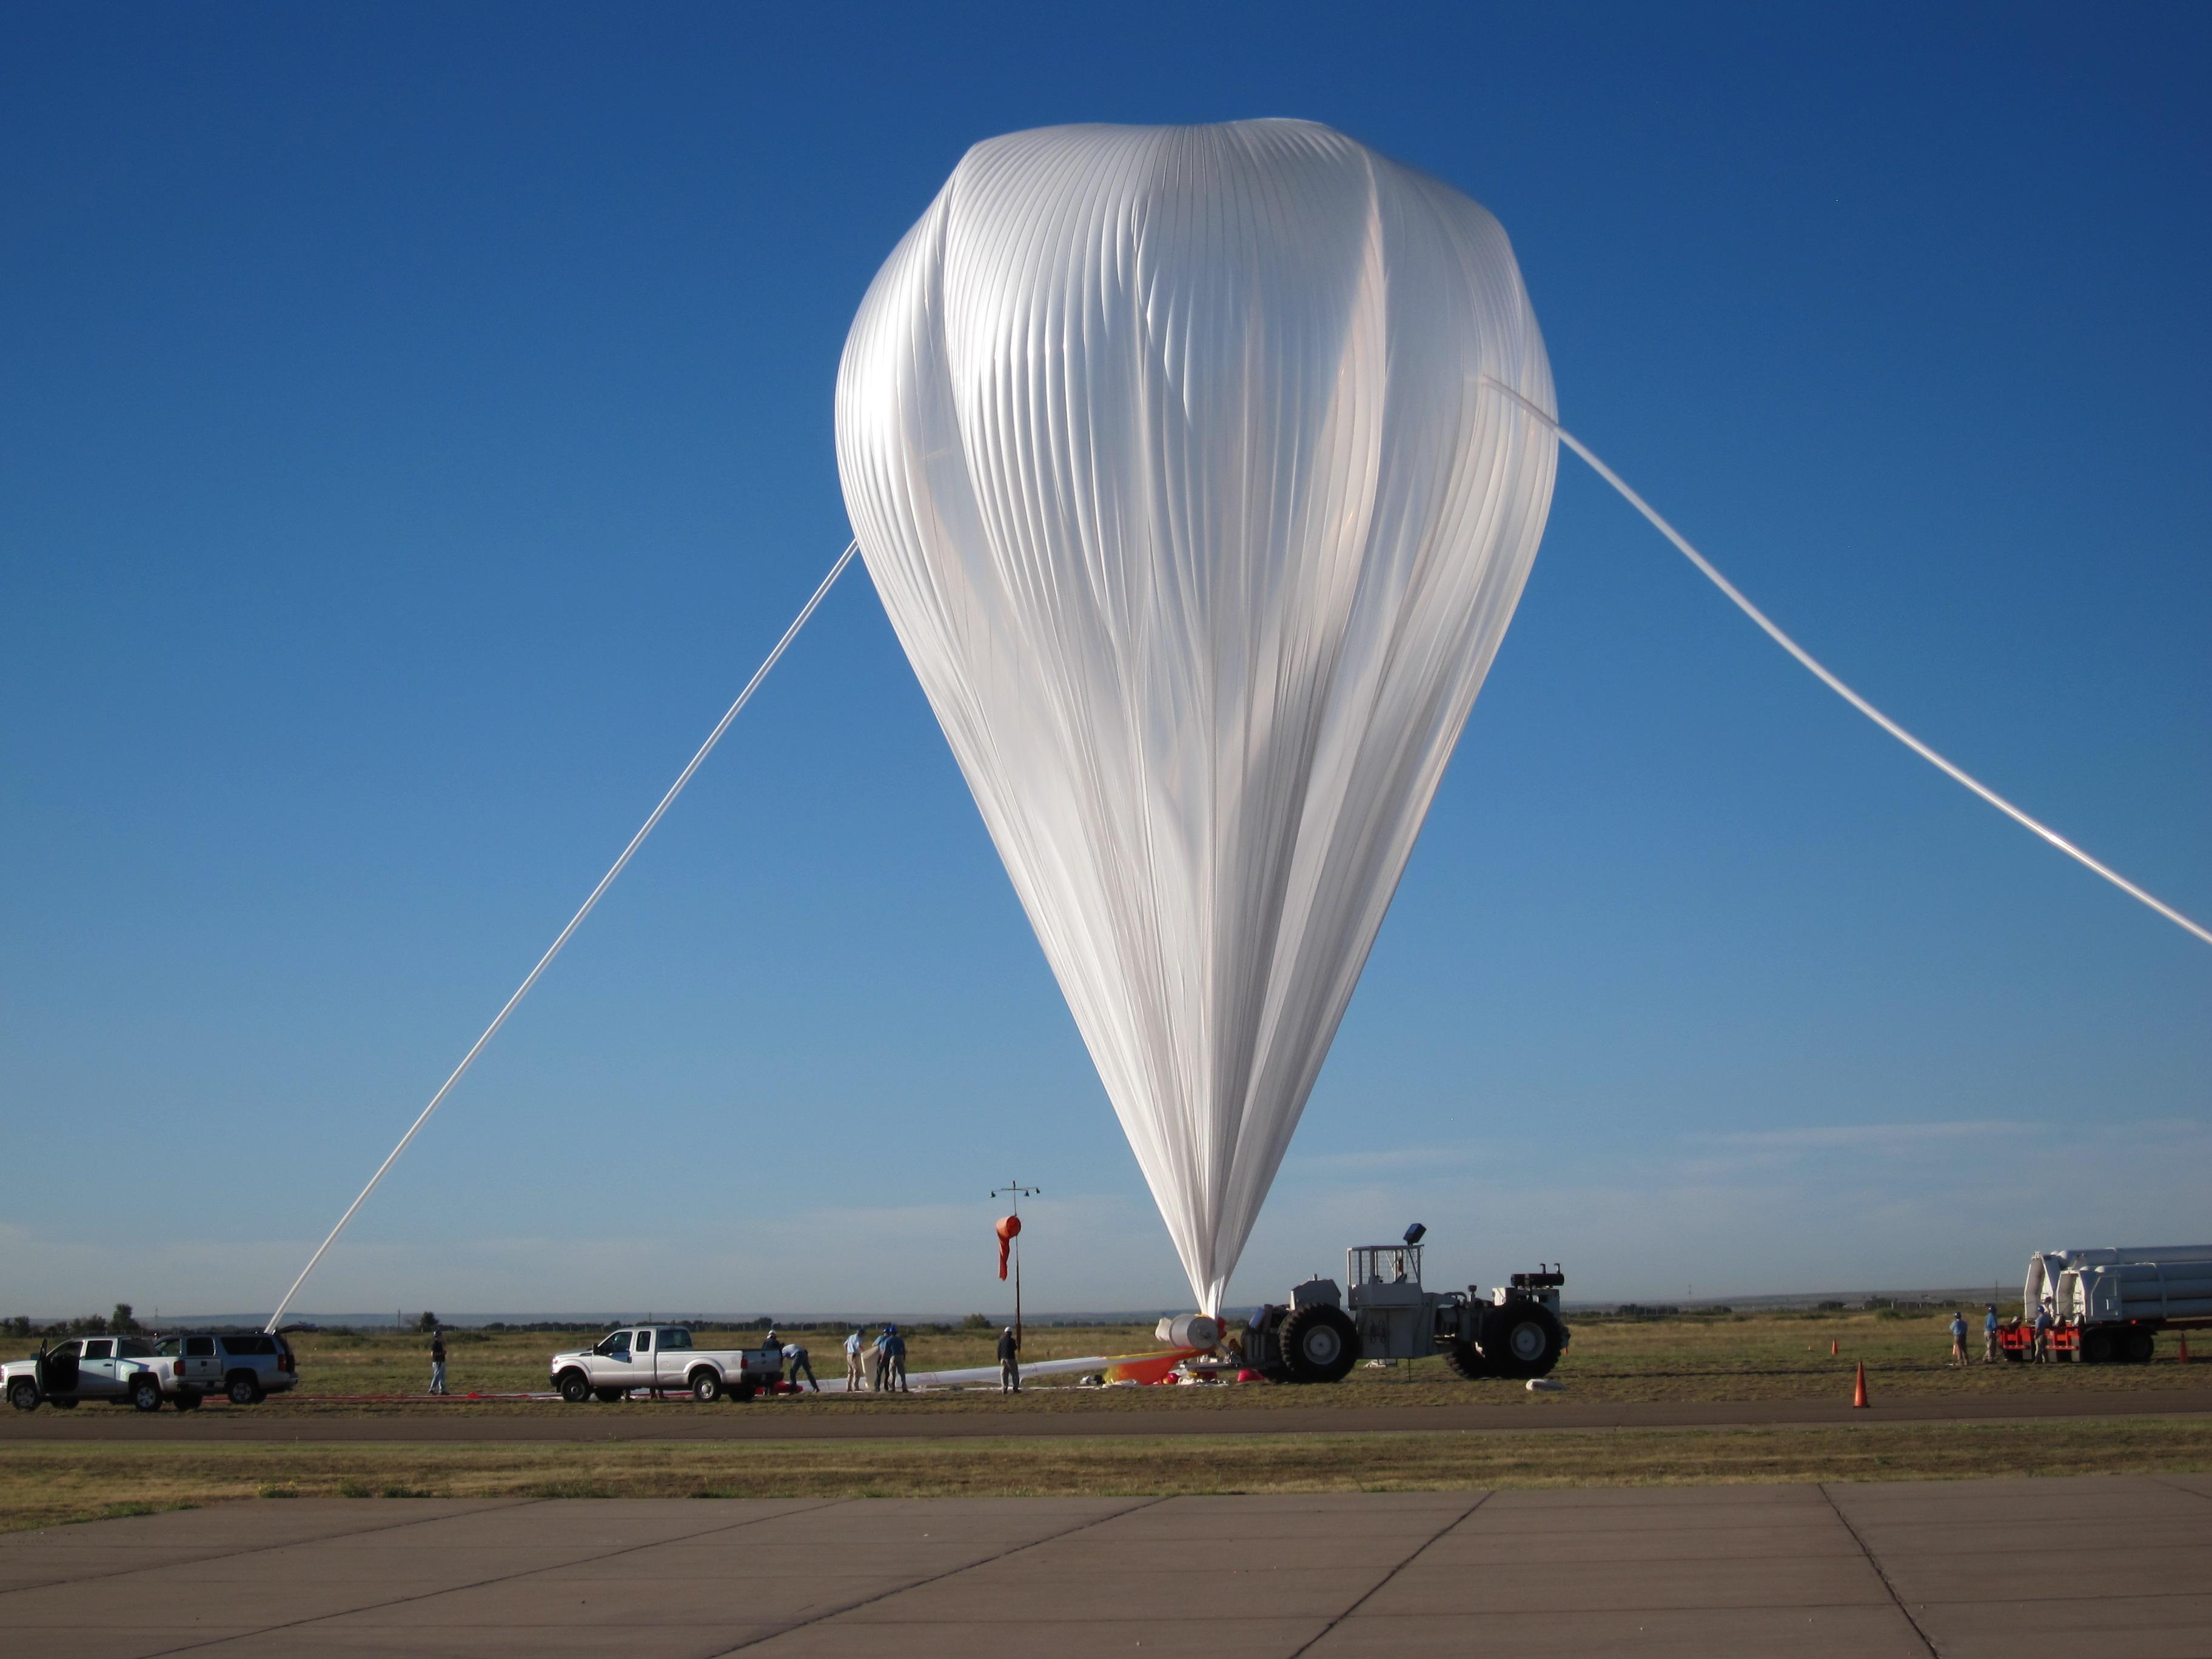 nasa u0027s e mist experiment soars in earth u0027s stratosphere nasa